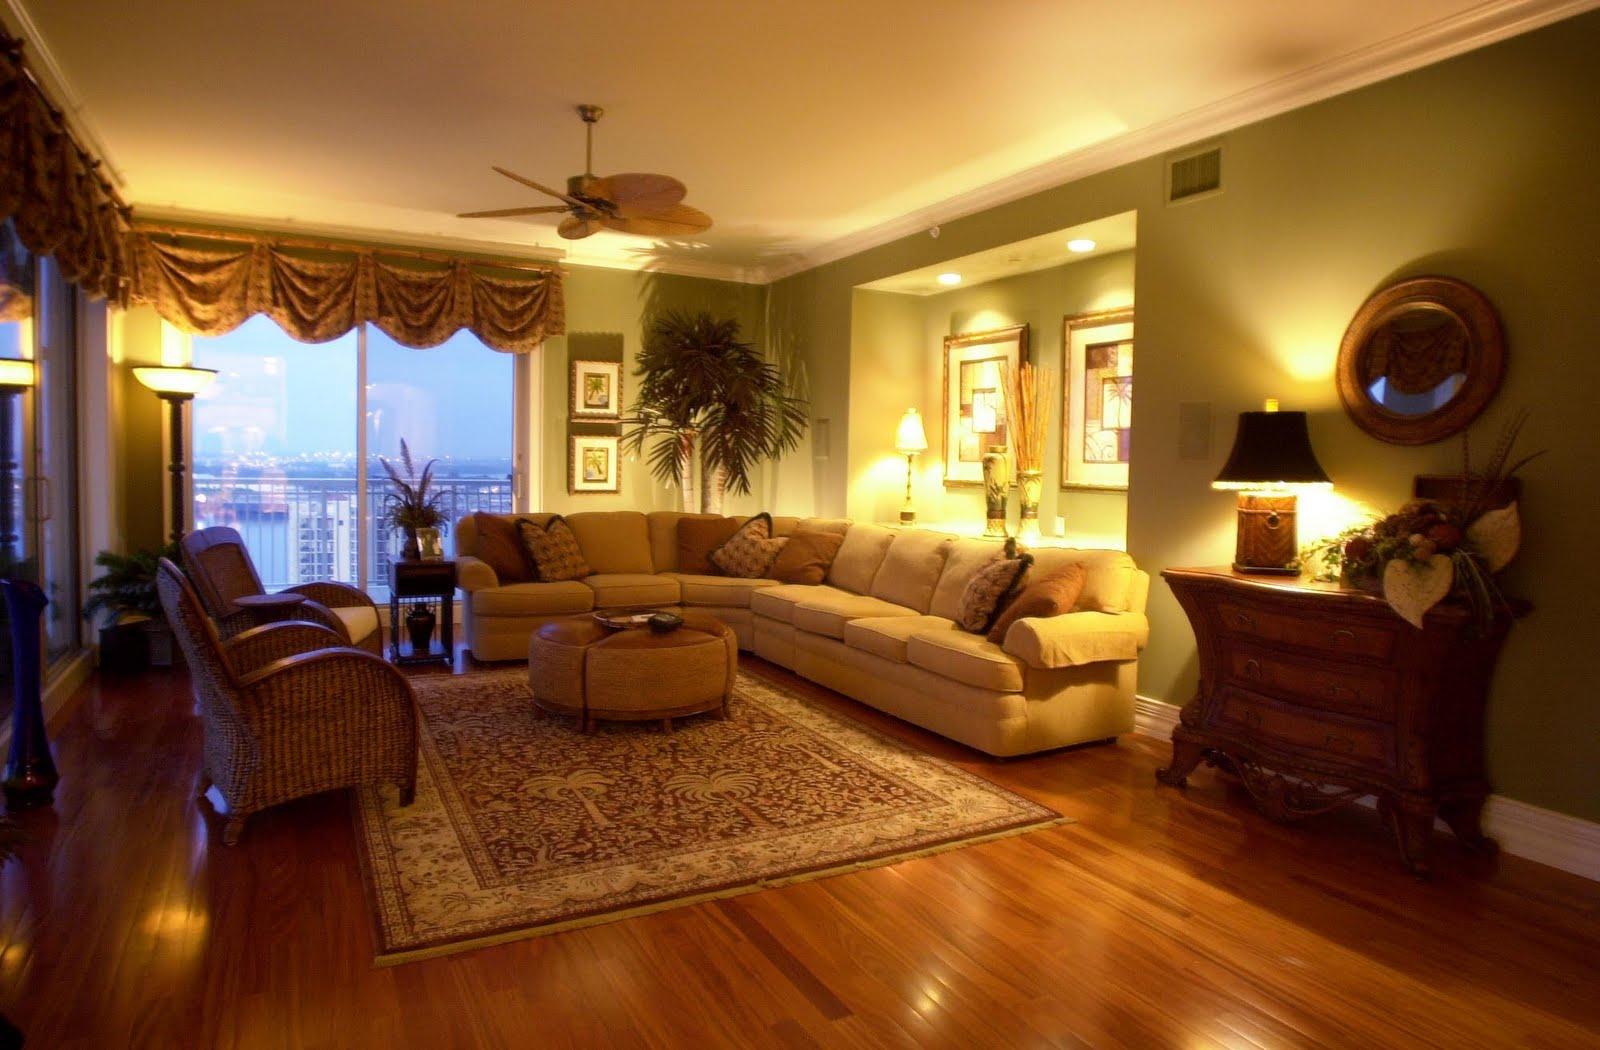 Tampa Florida Hardwood Flooring Company Tampa Florida